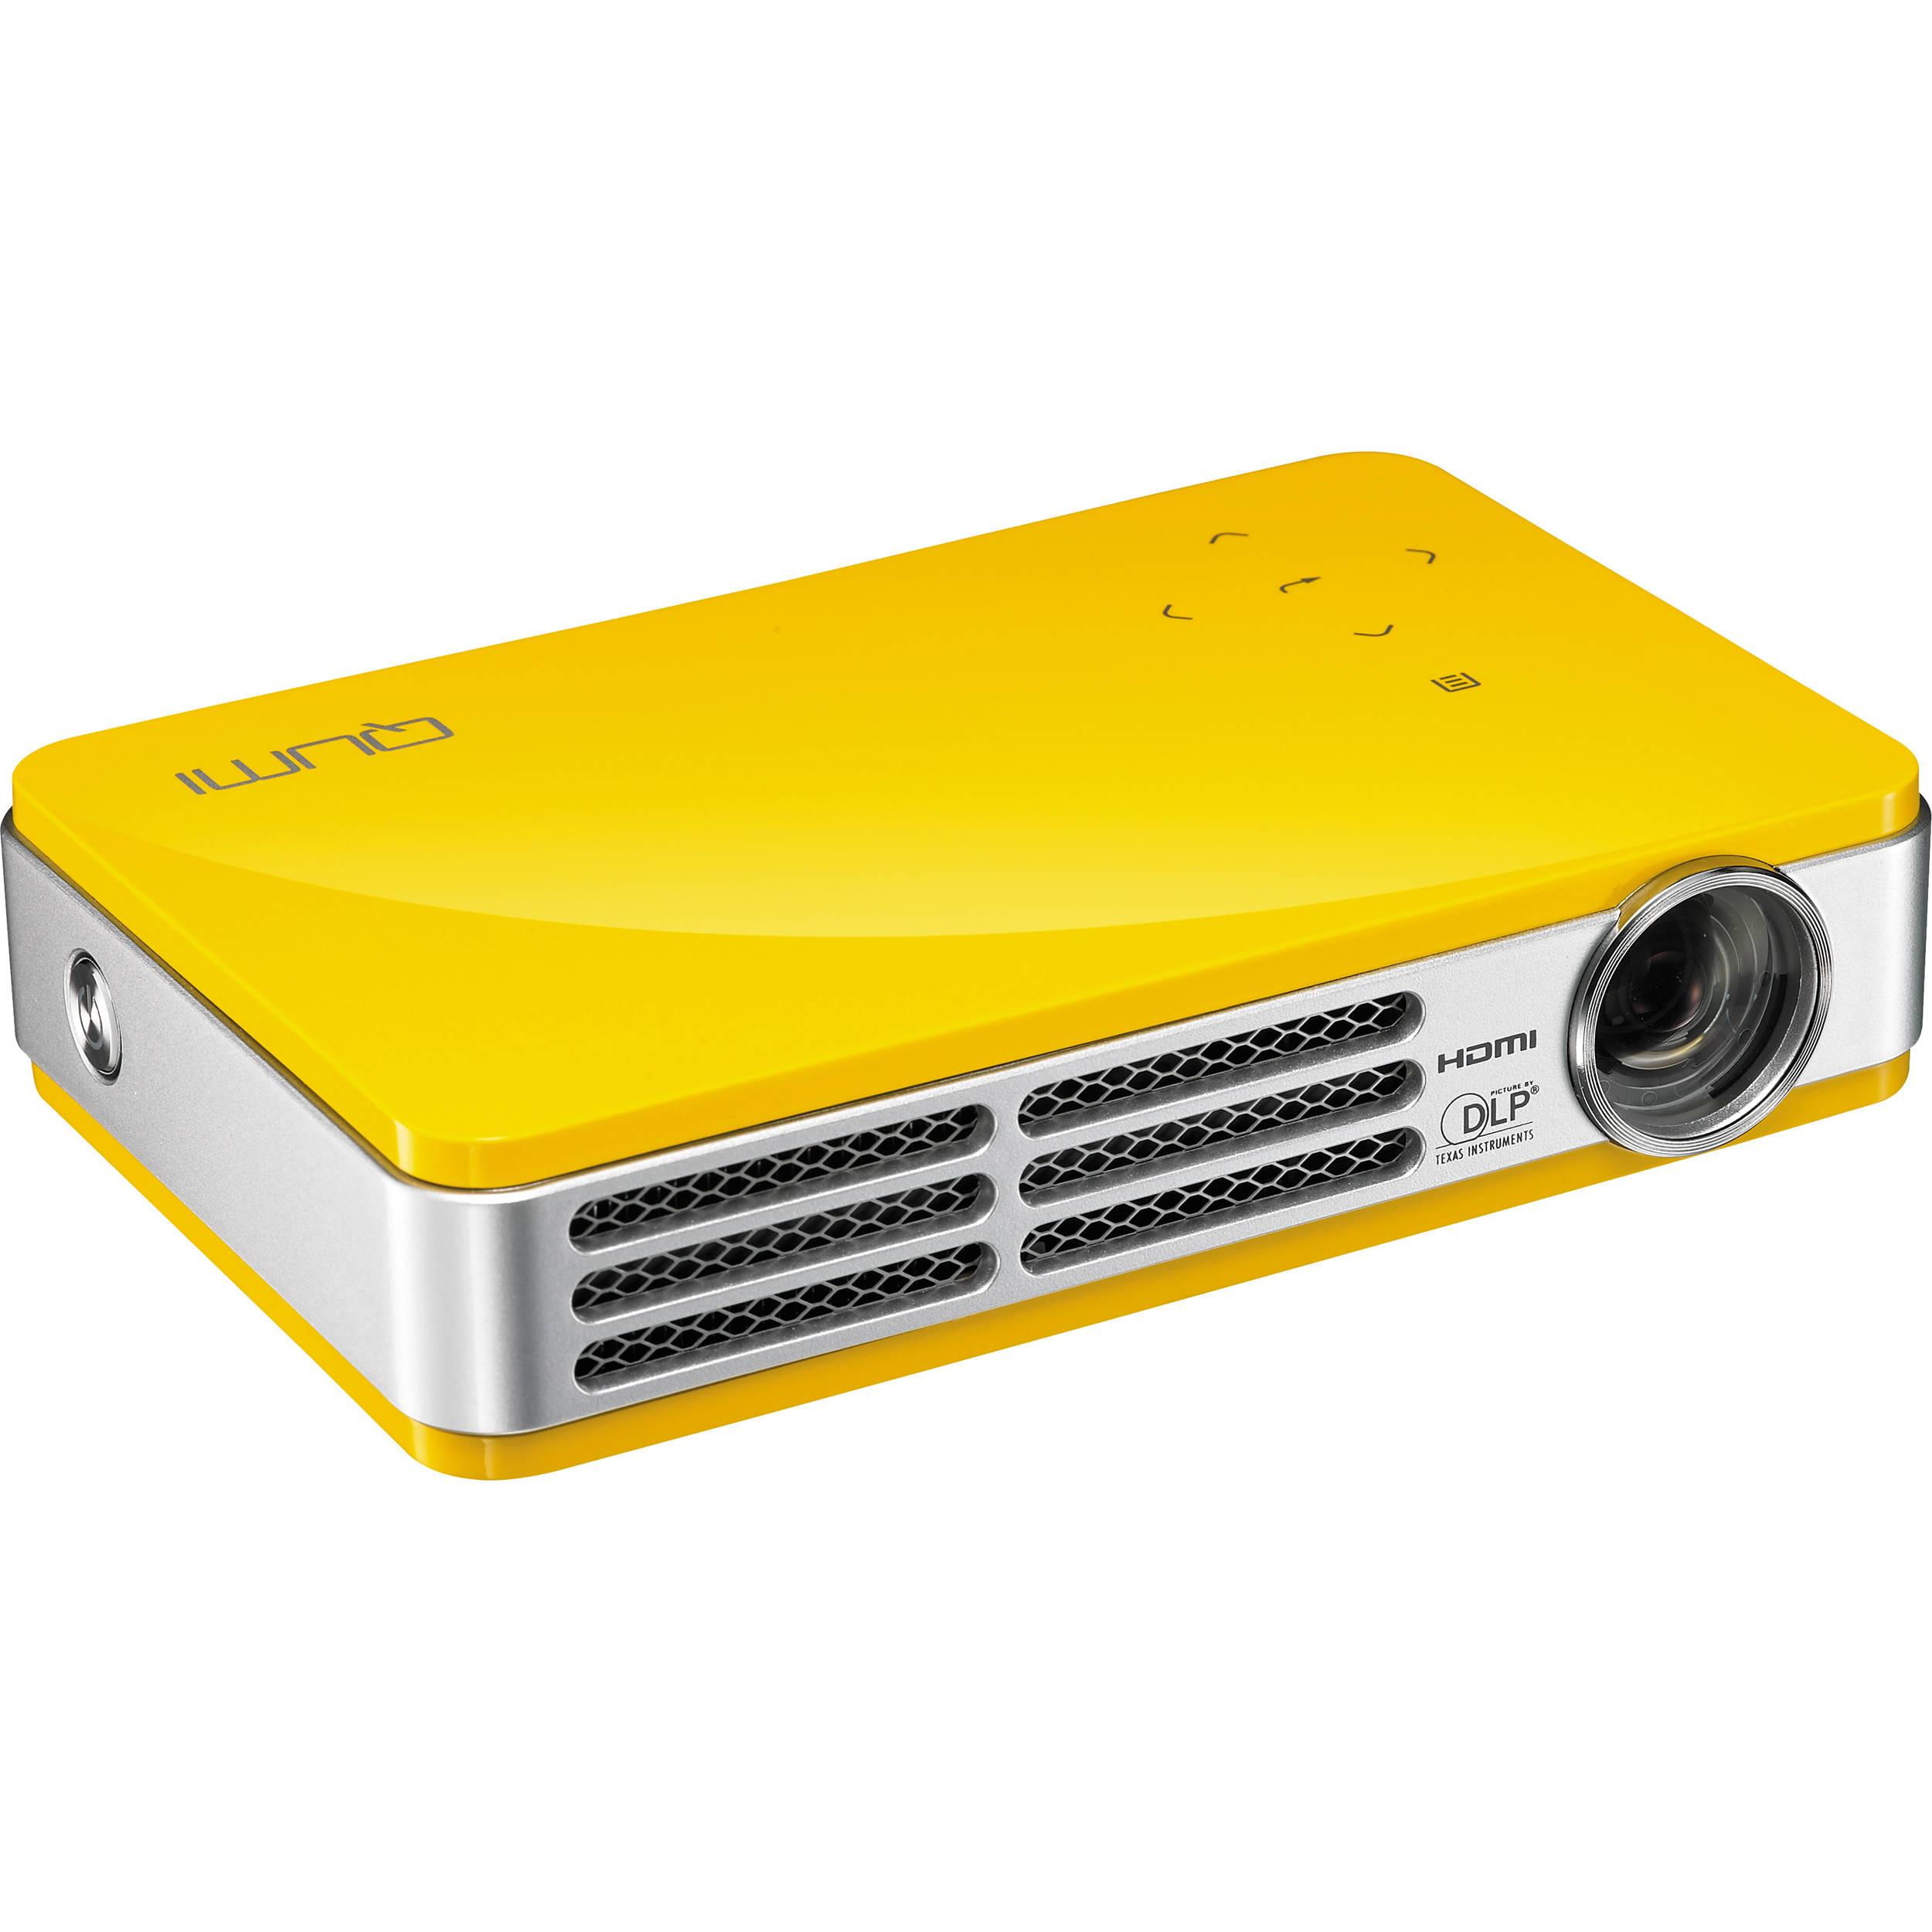 Vivitek qumi q5 super bright hd pocket projector 8 14964 for Best pocket projector for business